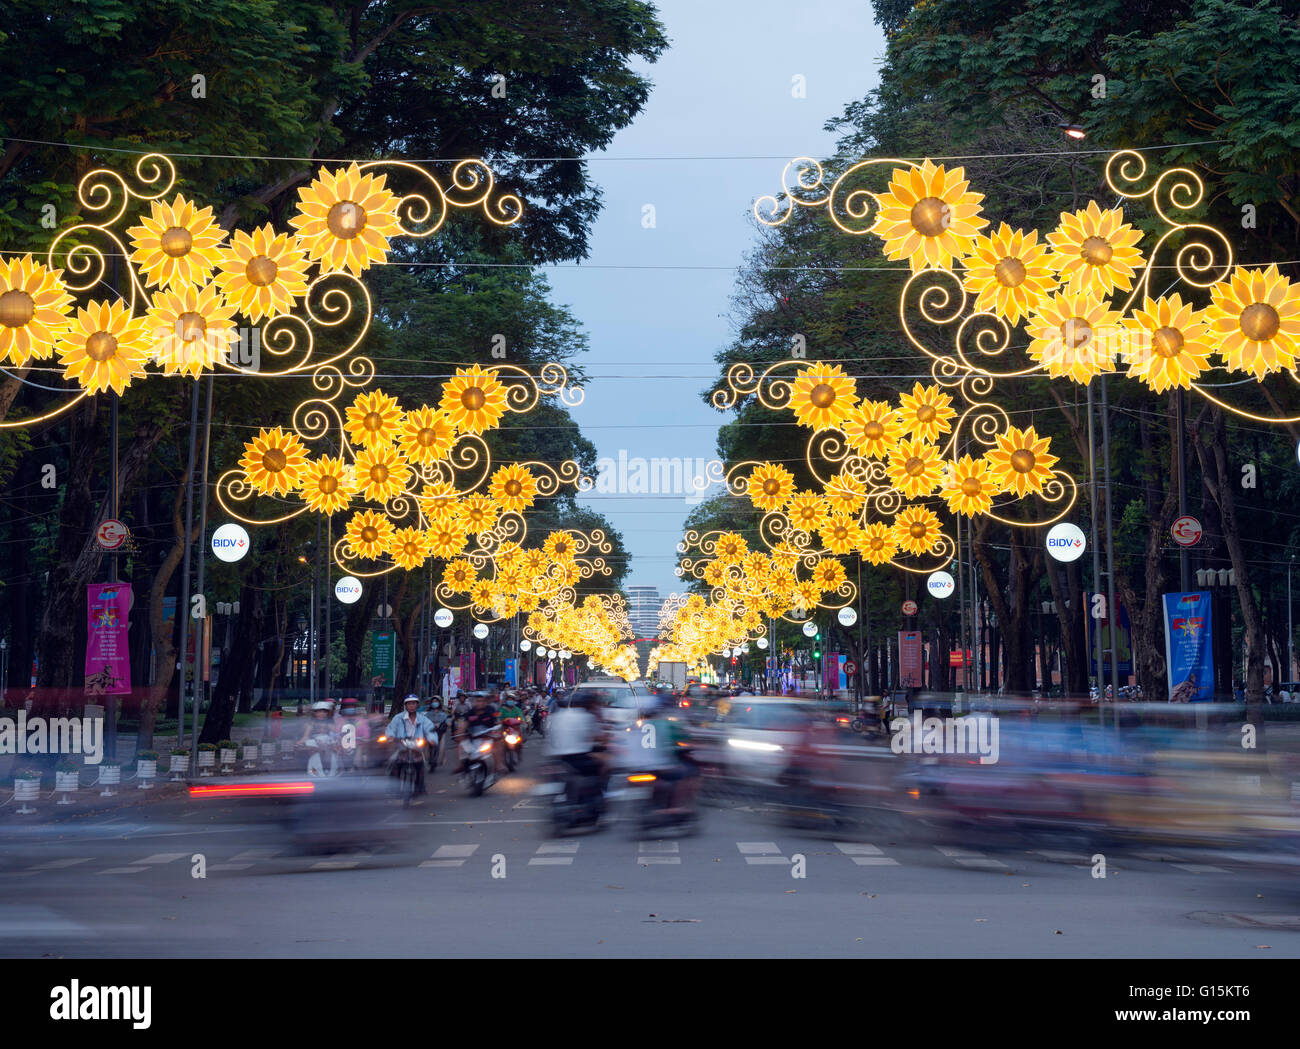 Feierabendverkehr, Ho-Chi-Minh-Stadt (Saigon), Vietnam, Indochina, Südostasien, Asien Stockbild